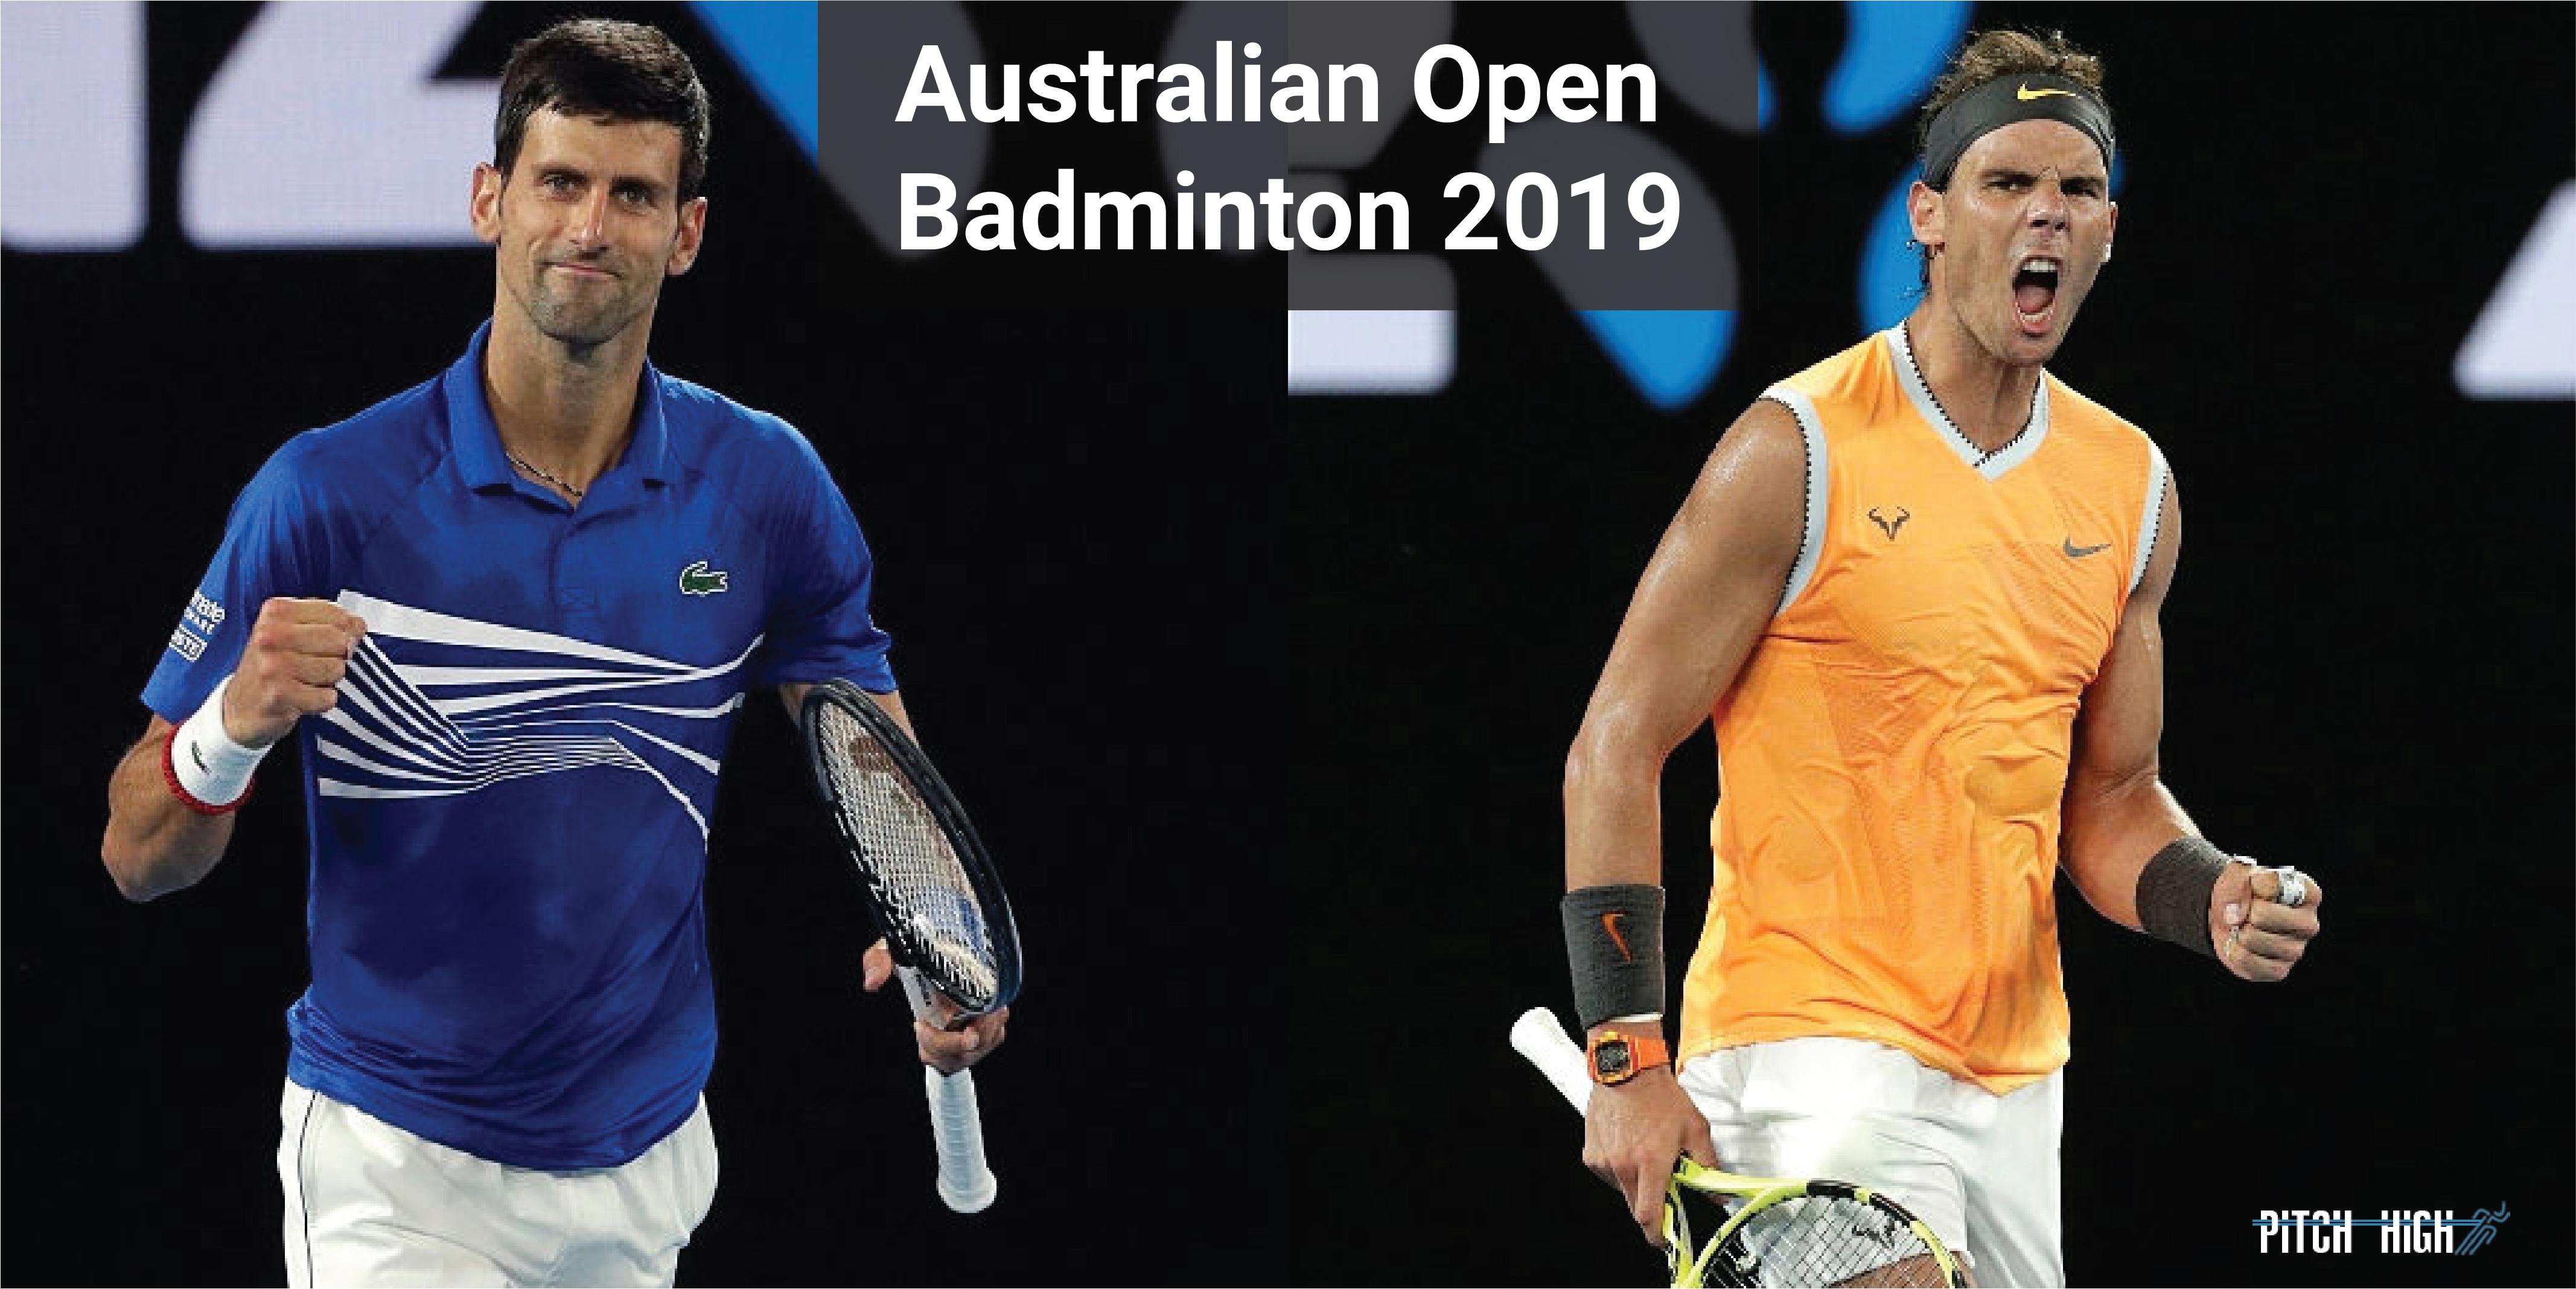 Australian Open Badminton 2019 Matches